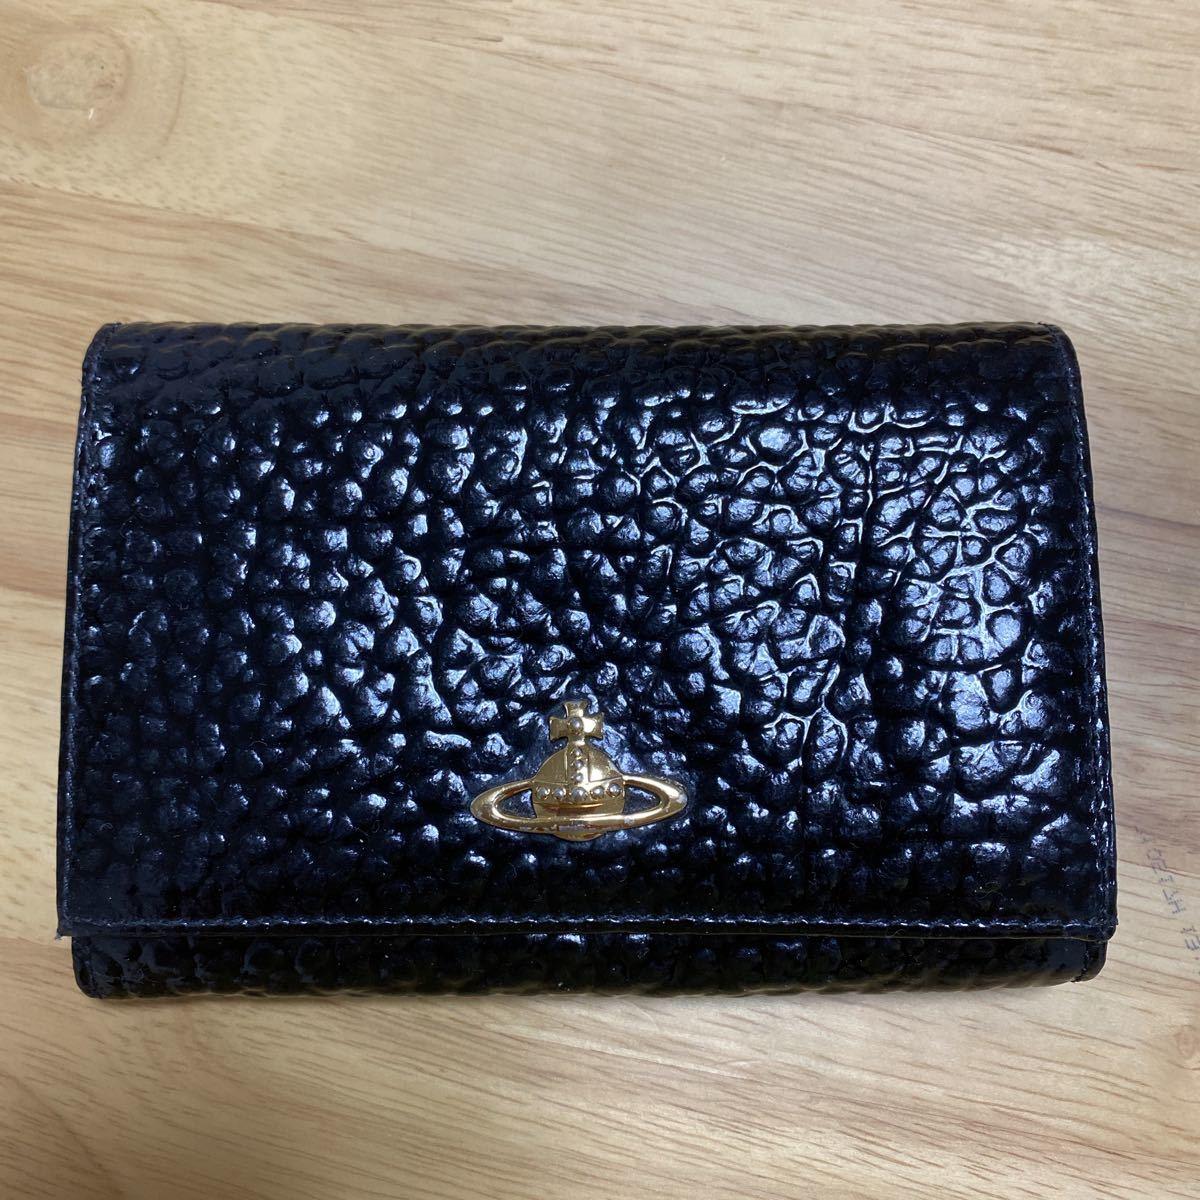 Vivienne Westwood ヴィヴィアンウエストウッド 二つ折り財布 エナメルレザー ブラック